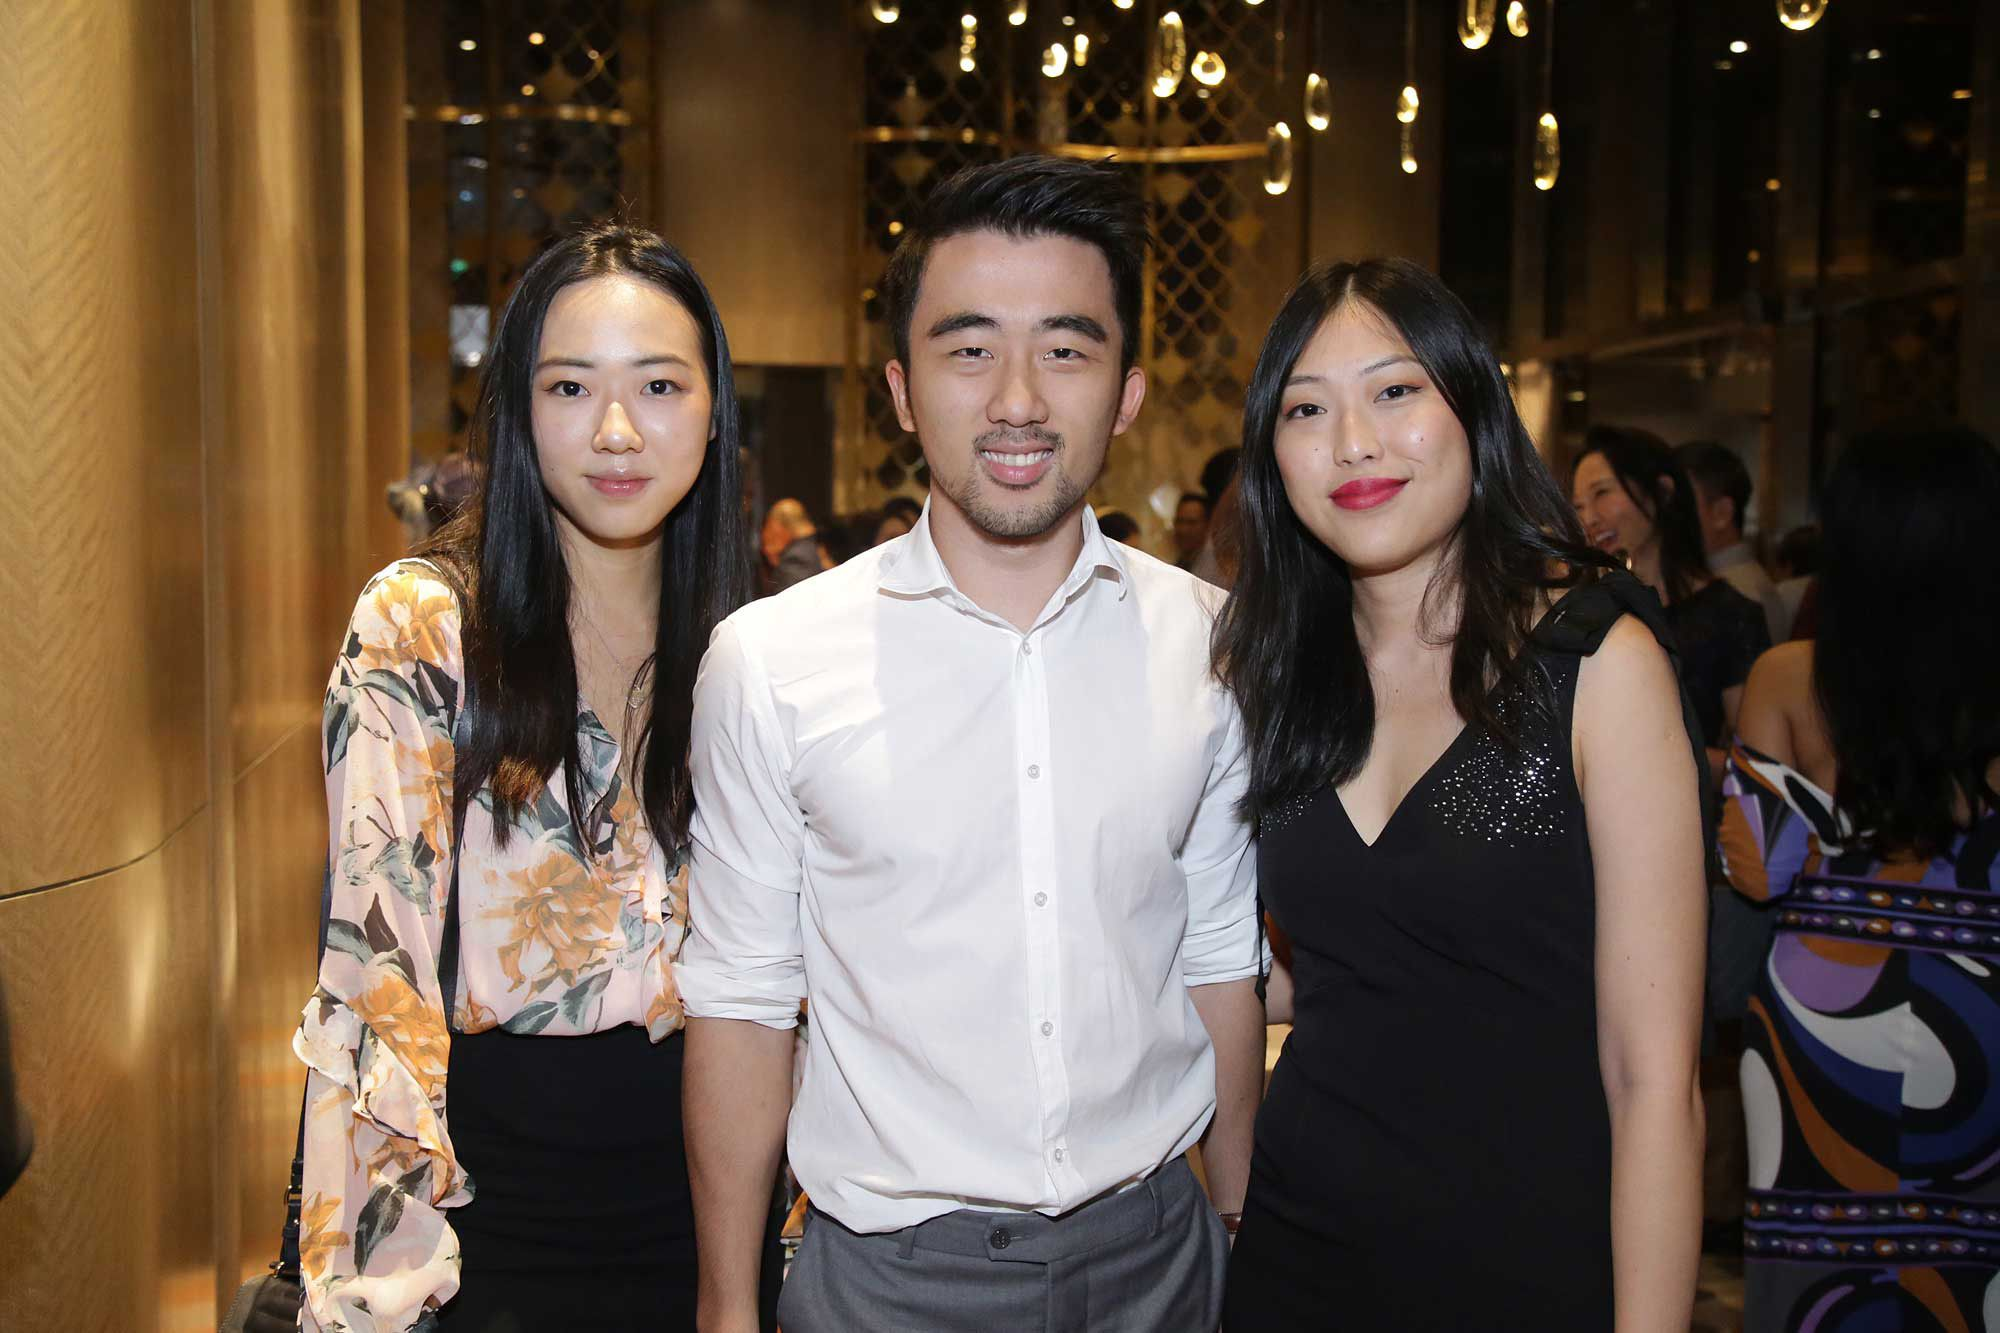 Michelle Teo, Ronald Teo and Li Ling Ng